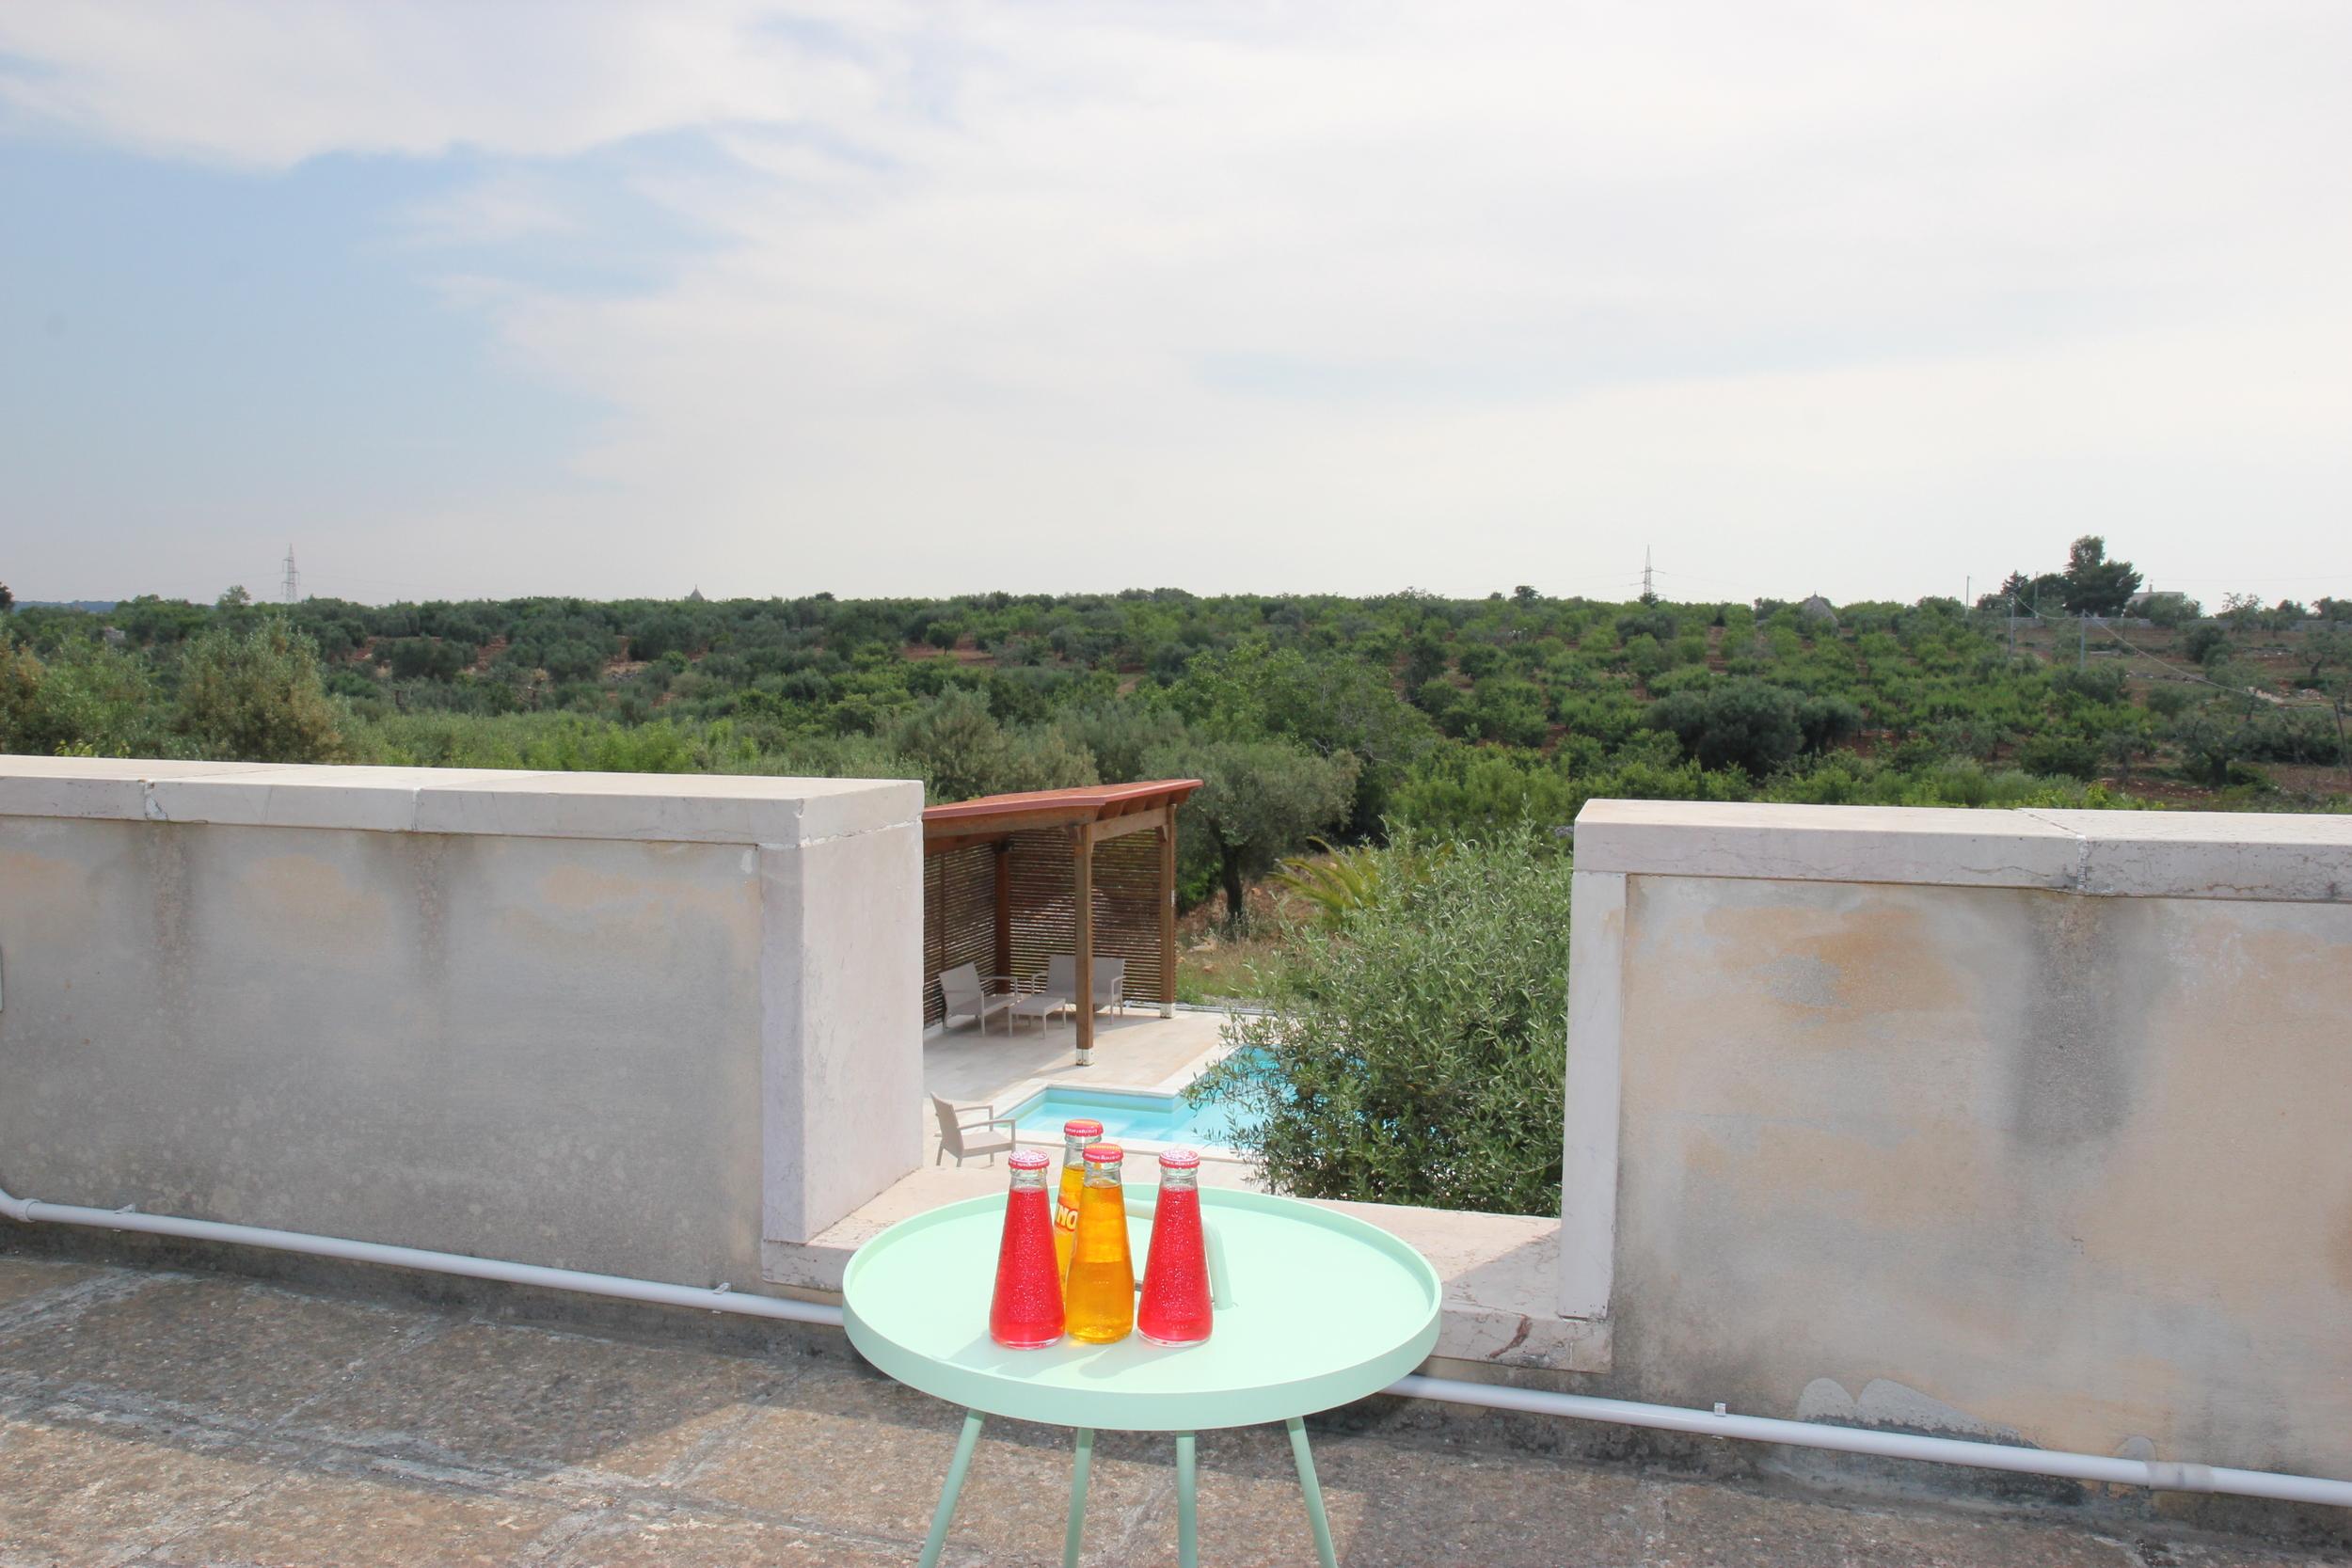 Puglia 2015-06 292.JPG